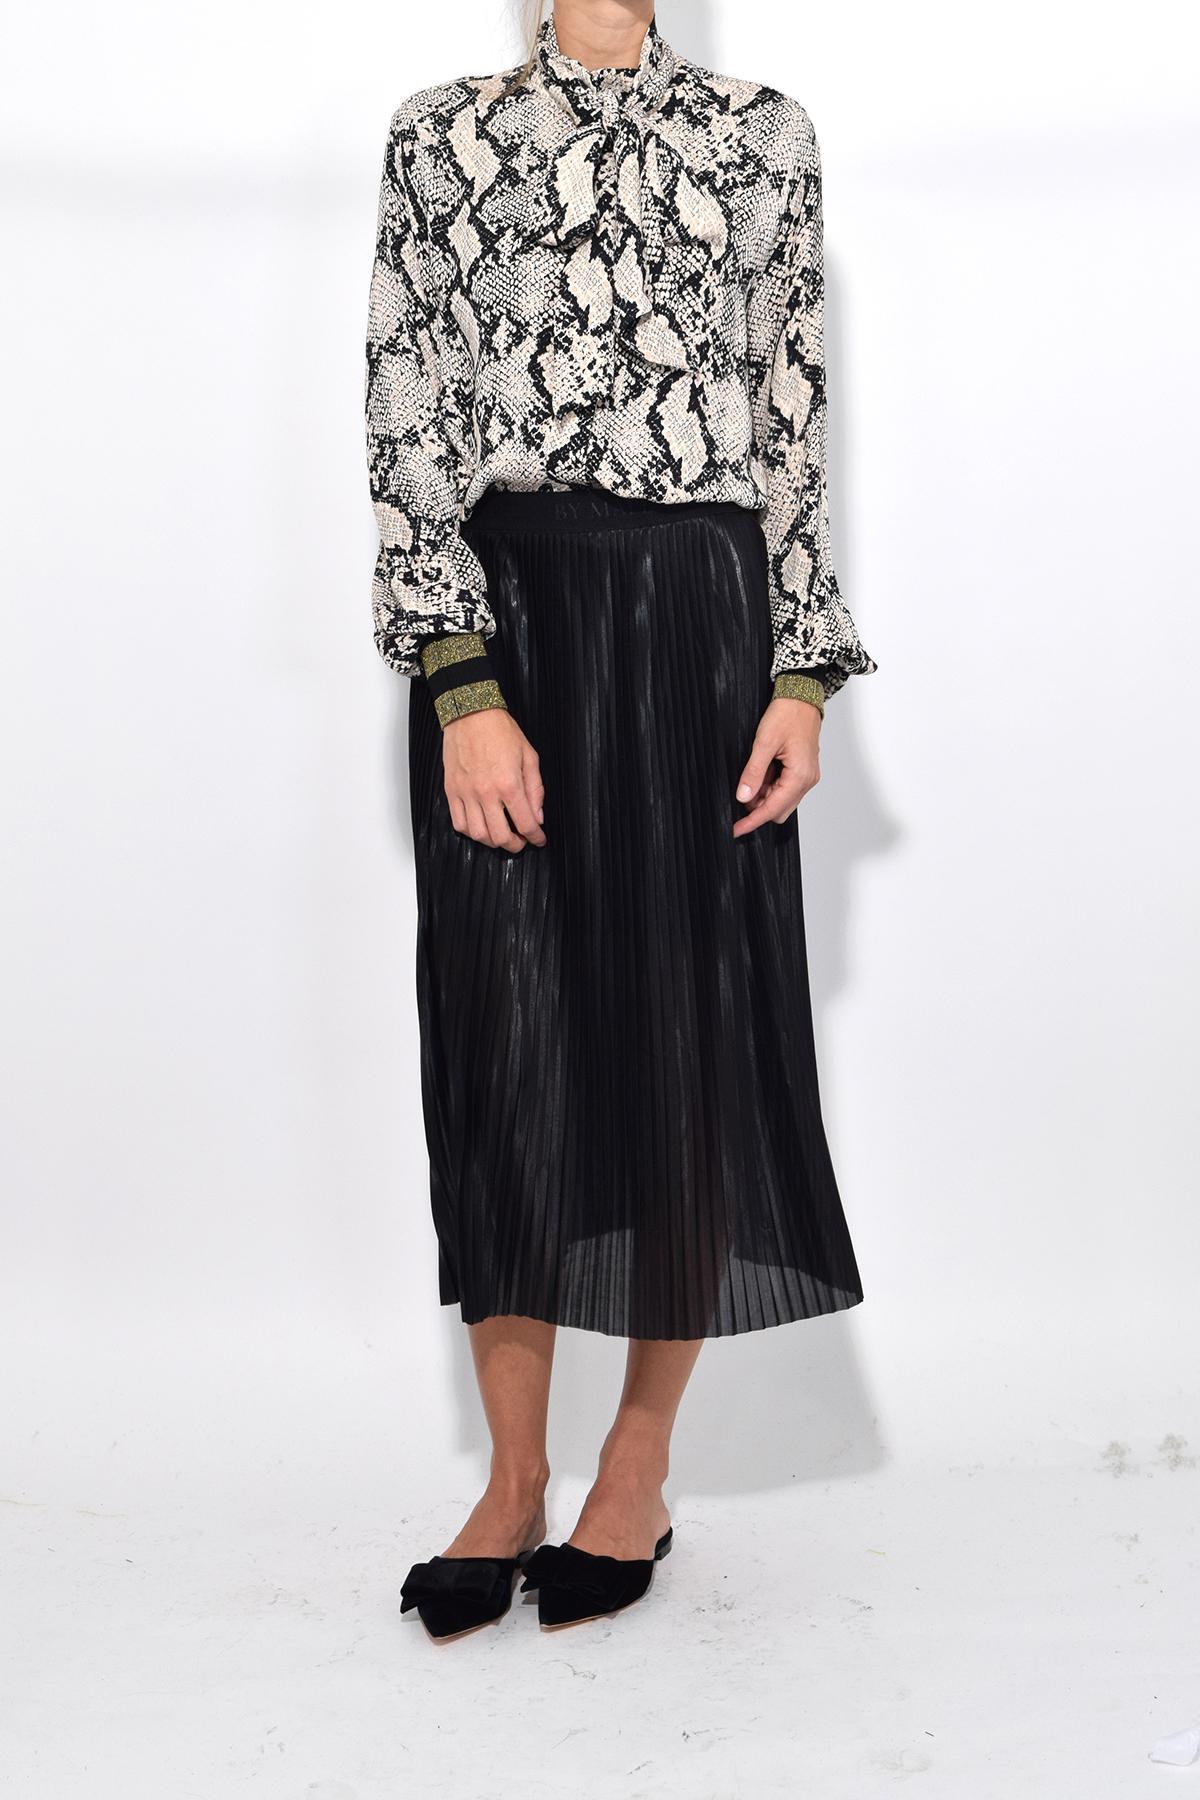 3dc9968a4 By Malene Birger Iauno Skirt In Black